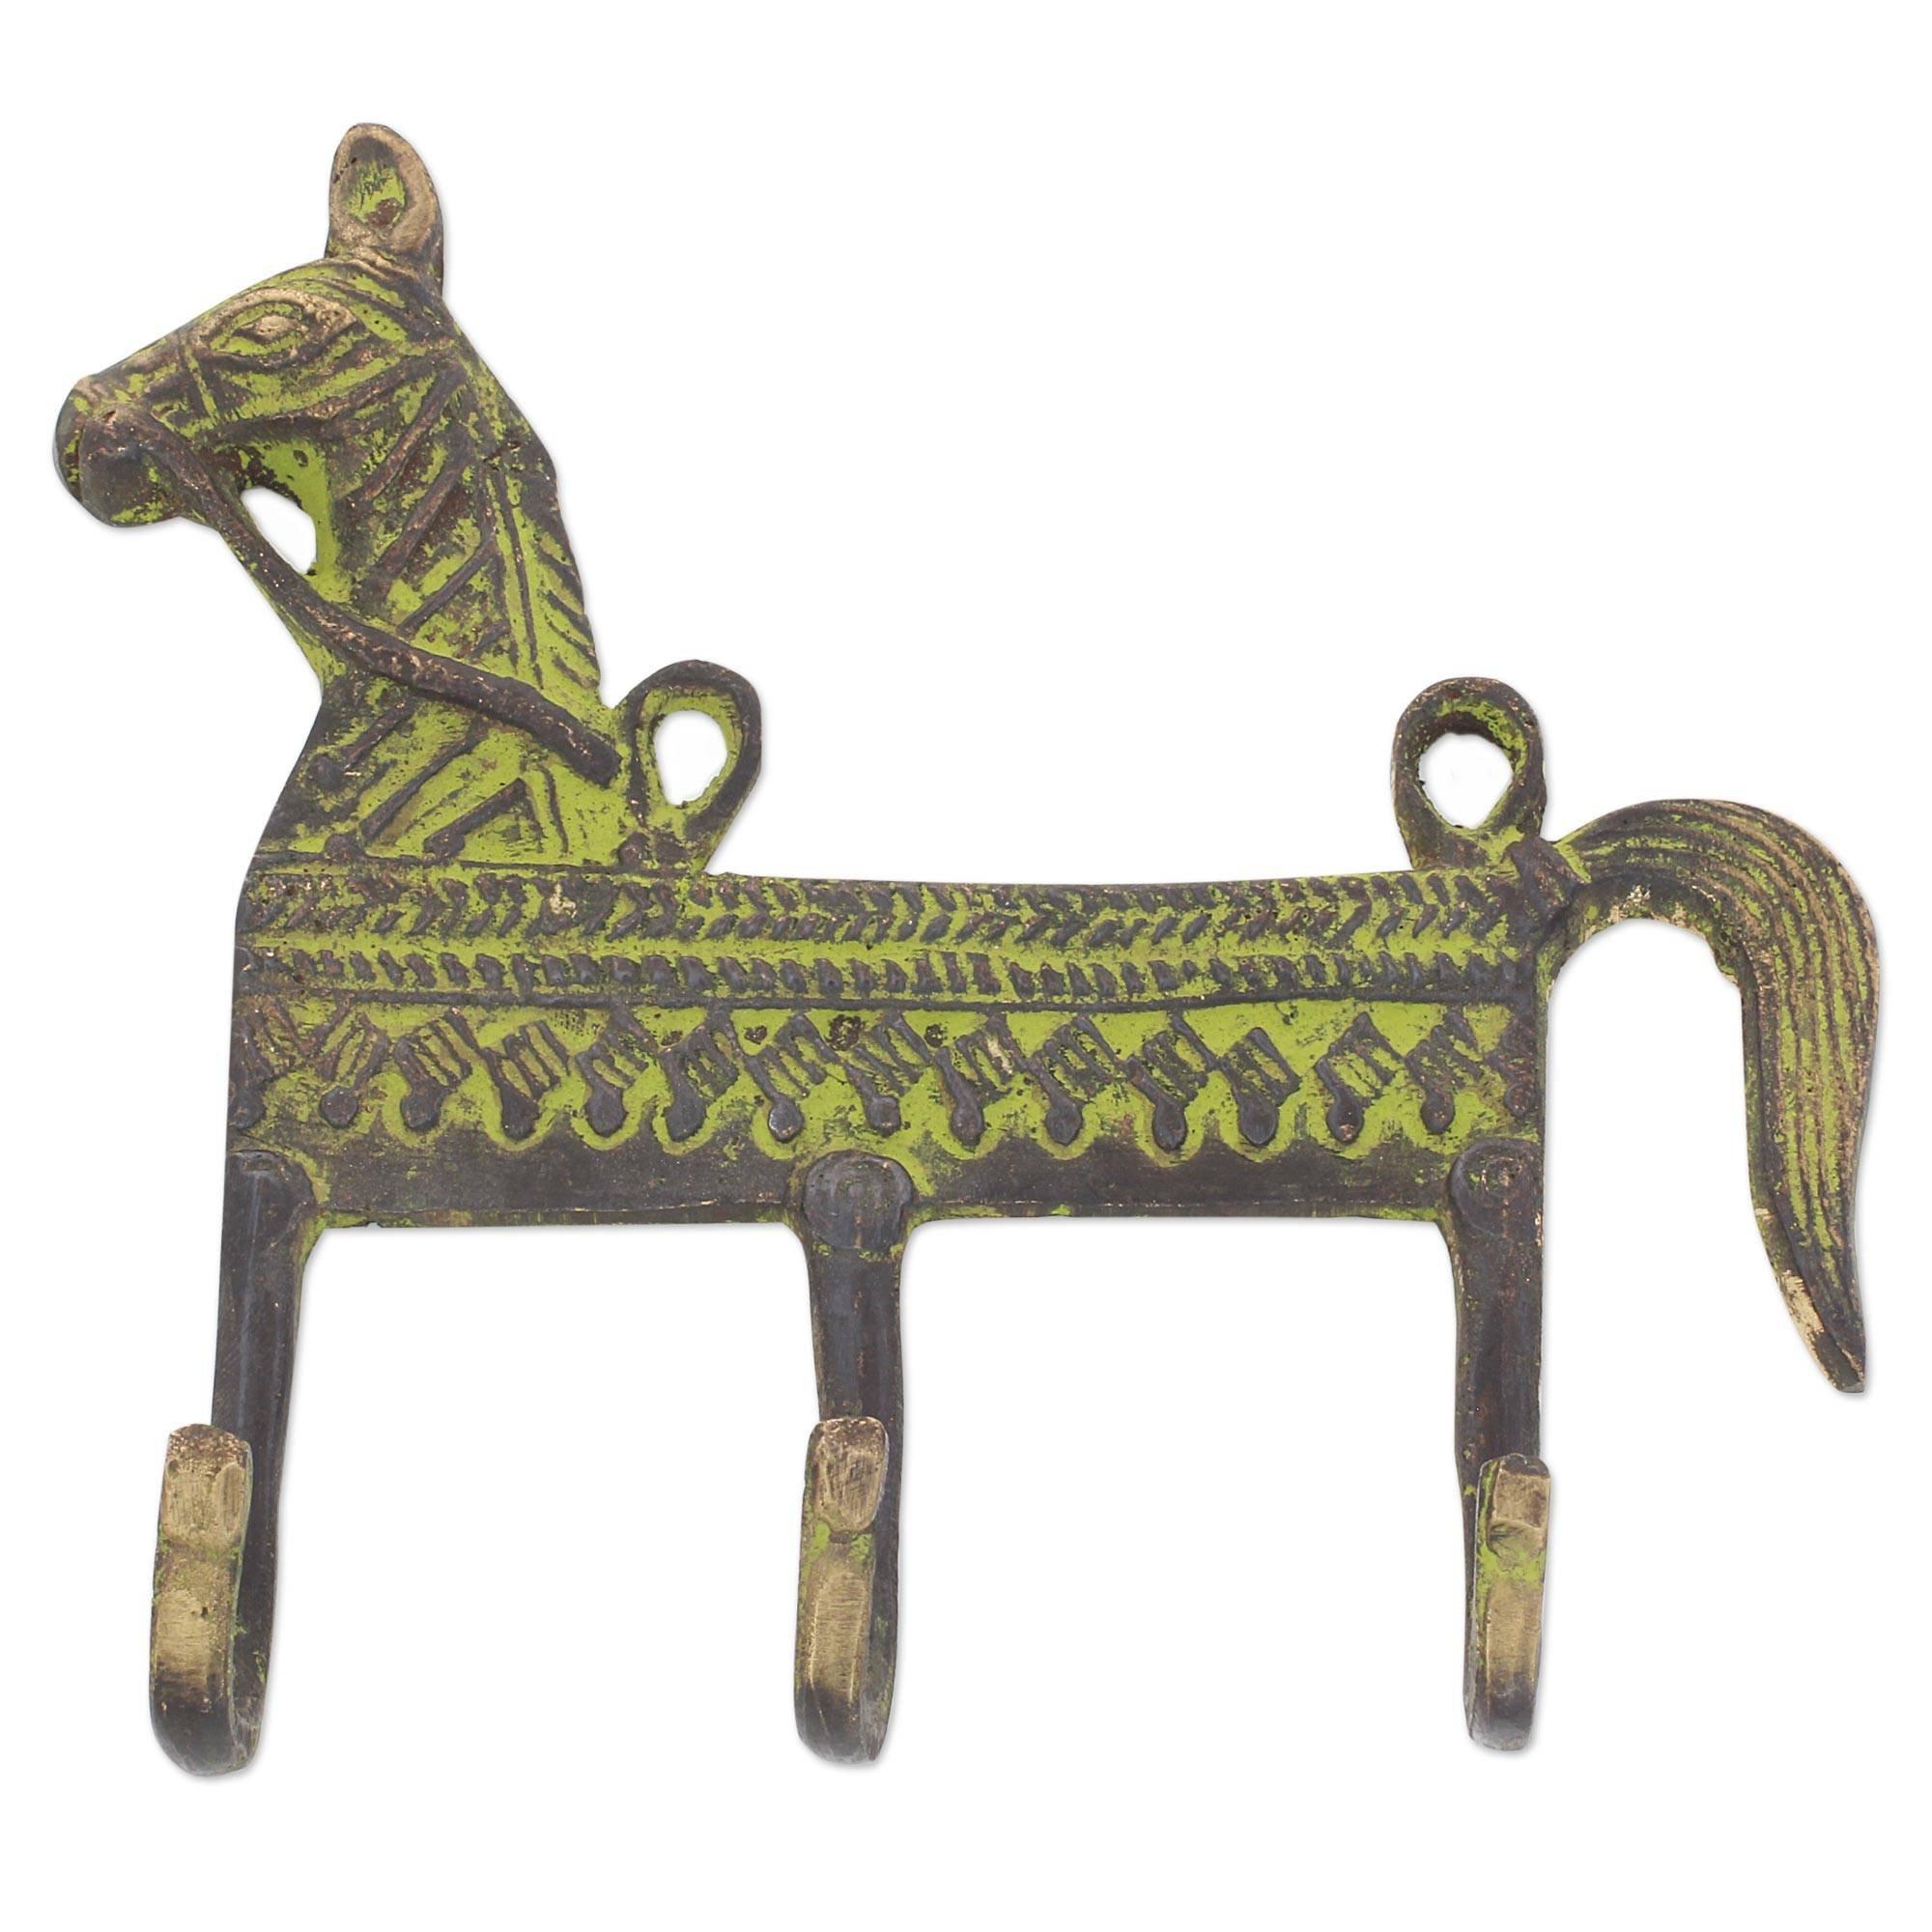 NOVICA Animal Themed Metallic Brass Wall Mounted Coat Hanger, Green, Helpful Horse'